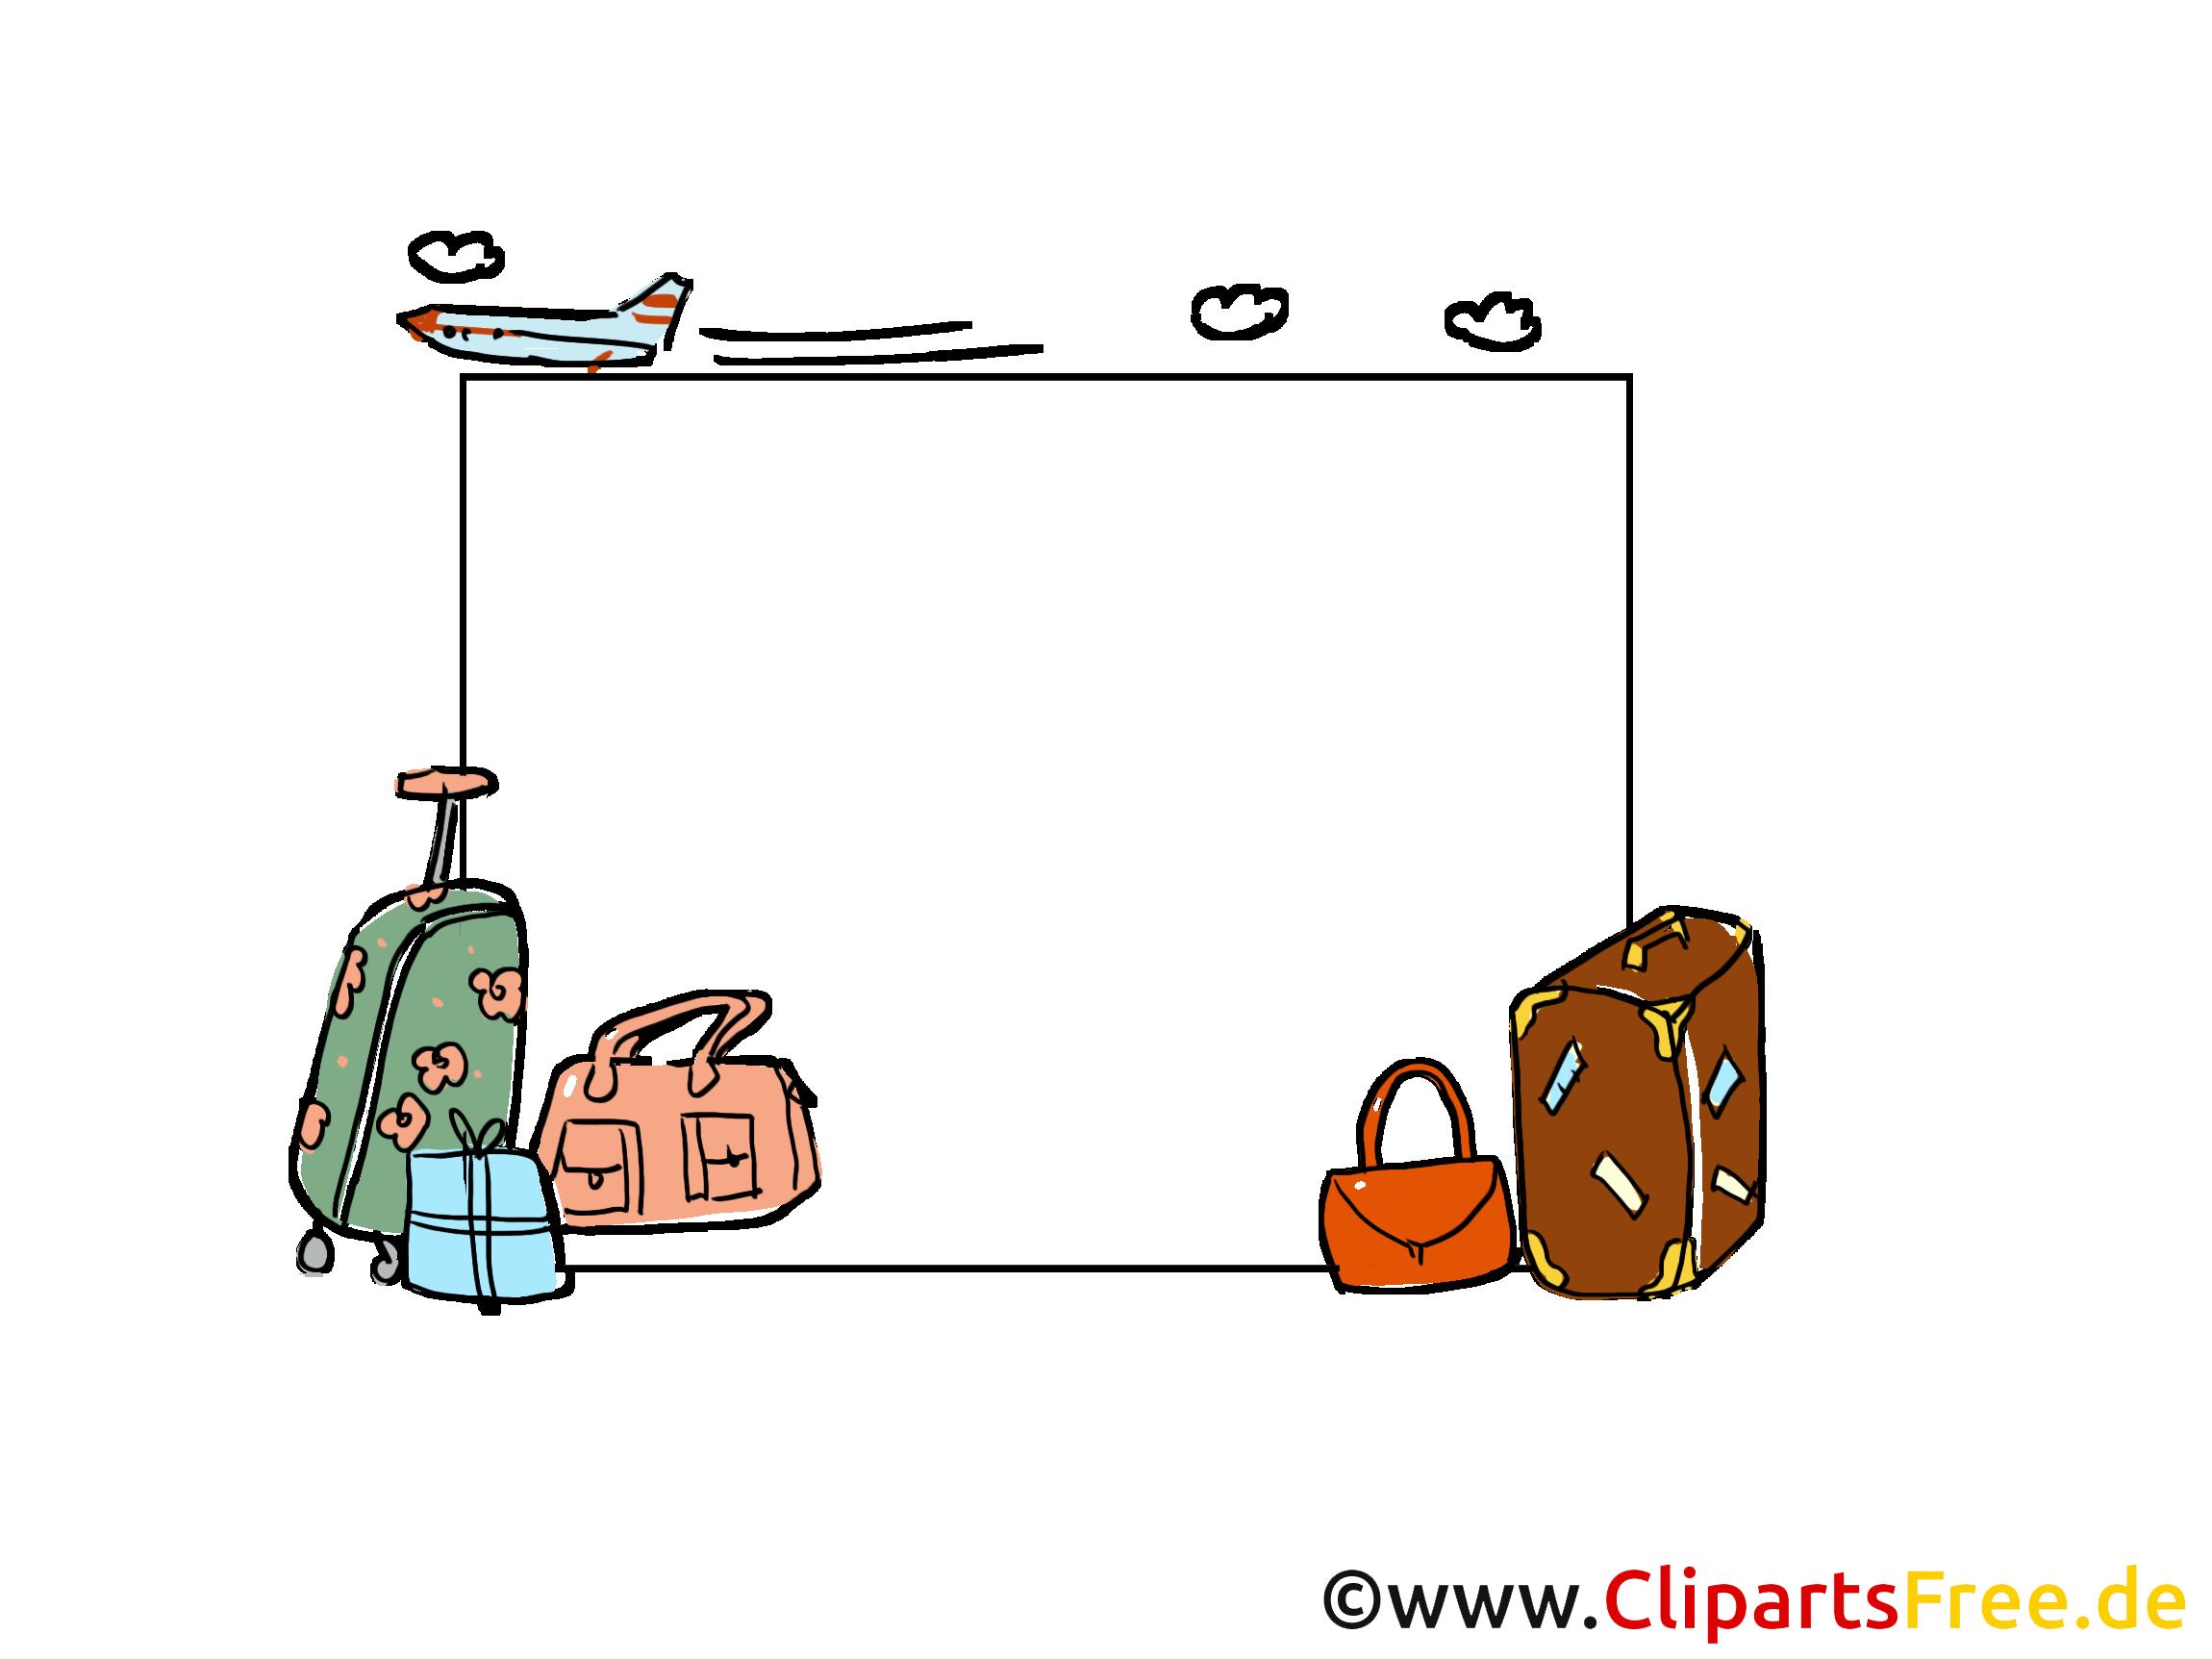 PNG Urlaub Gratis Transparent Urlaub Gratis.PNG Images. | PlusPNG